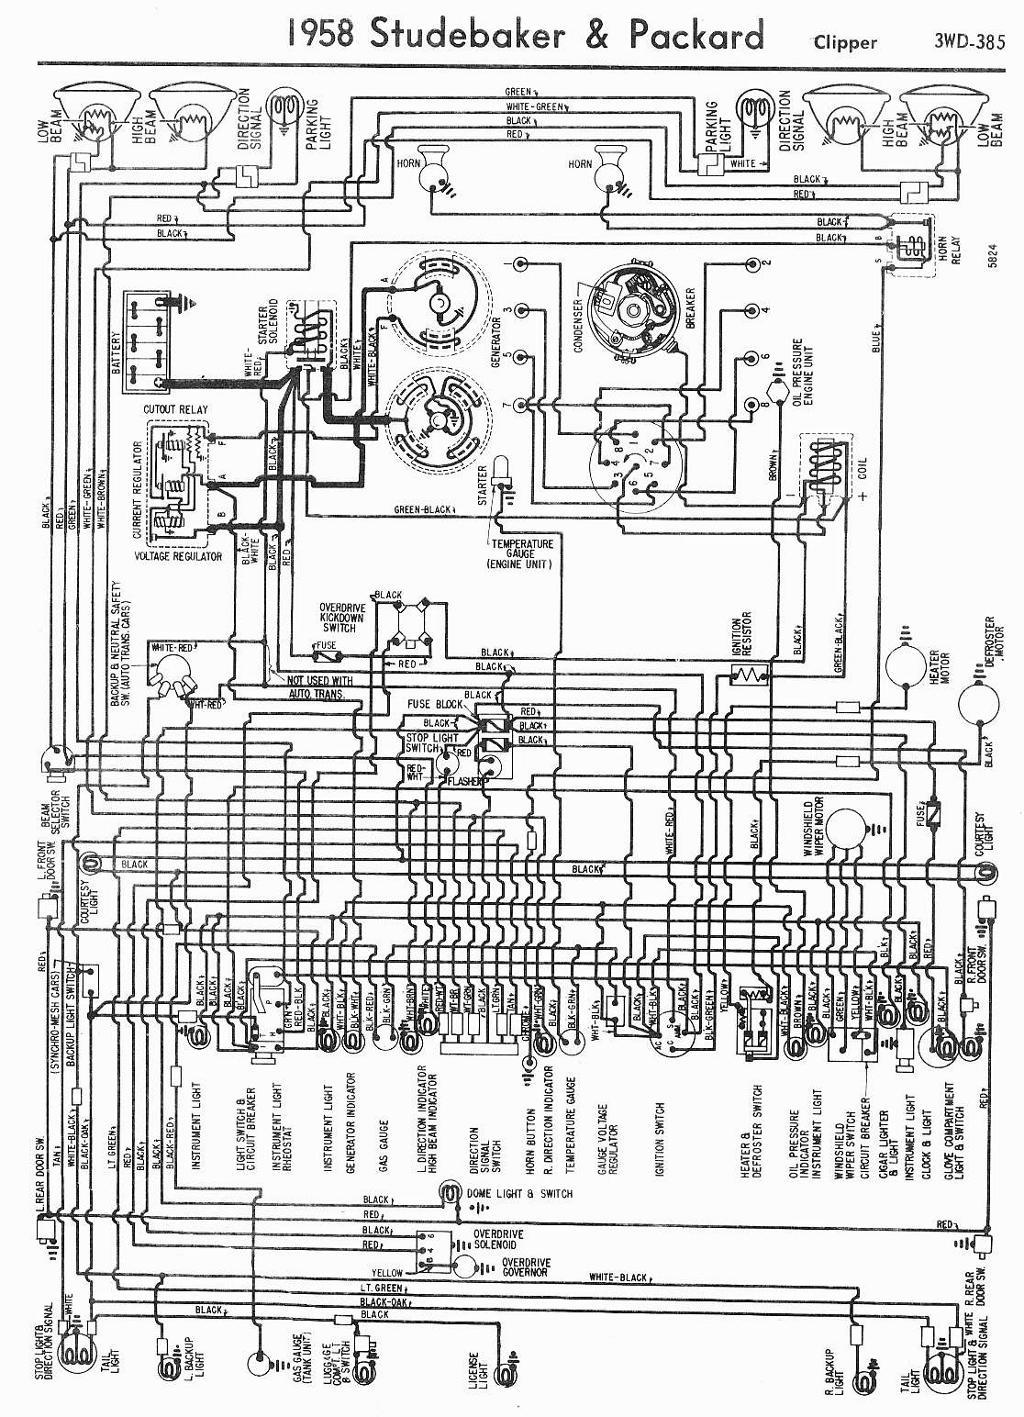 76 fiat 124 wiring diagram [ 1024 x 1417 Pixel ]